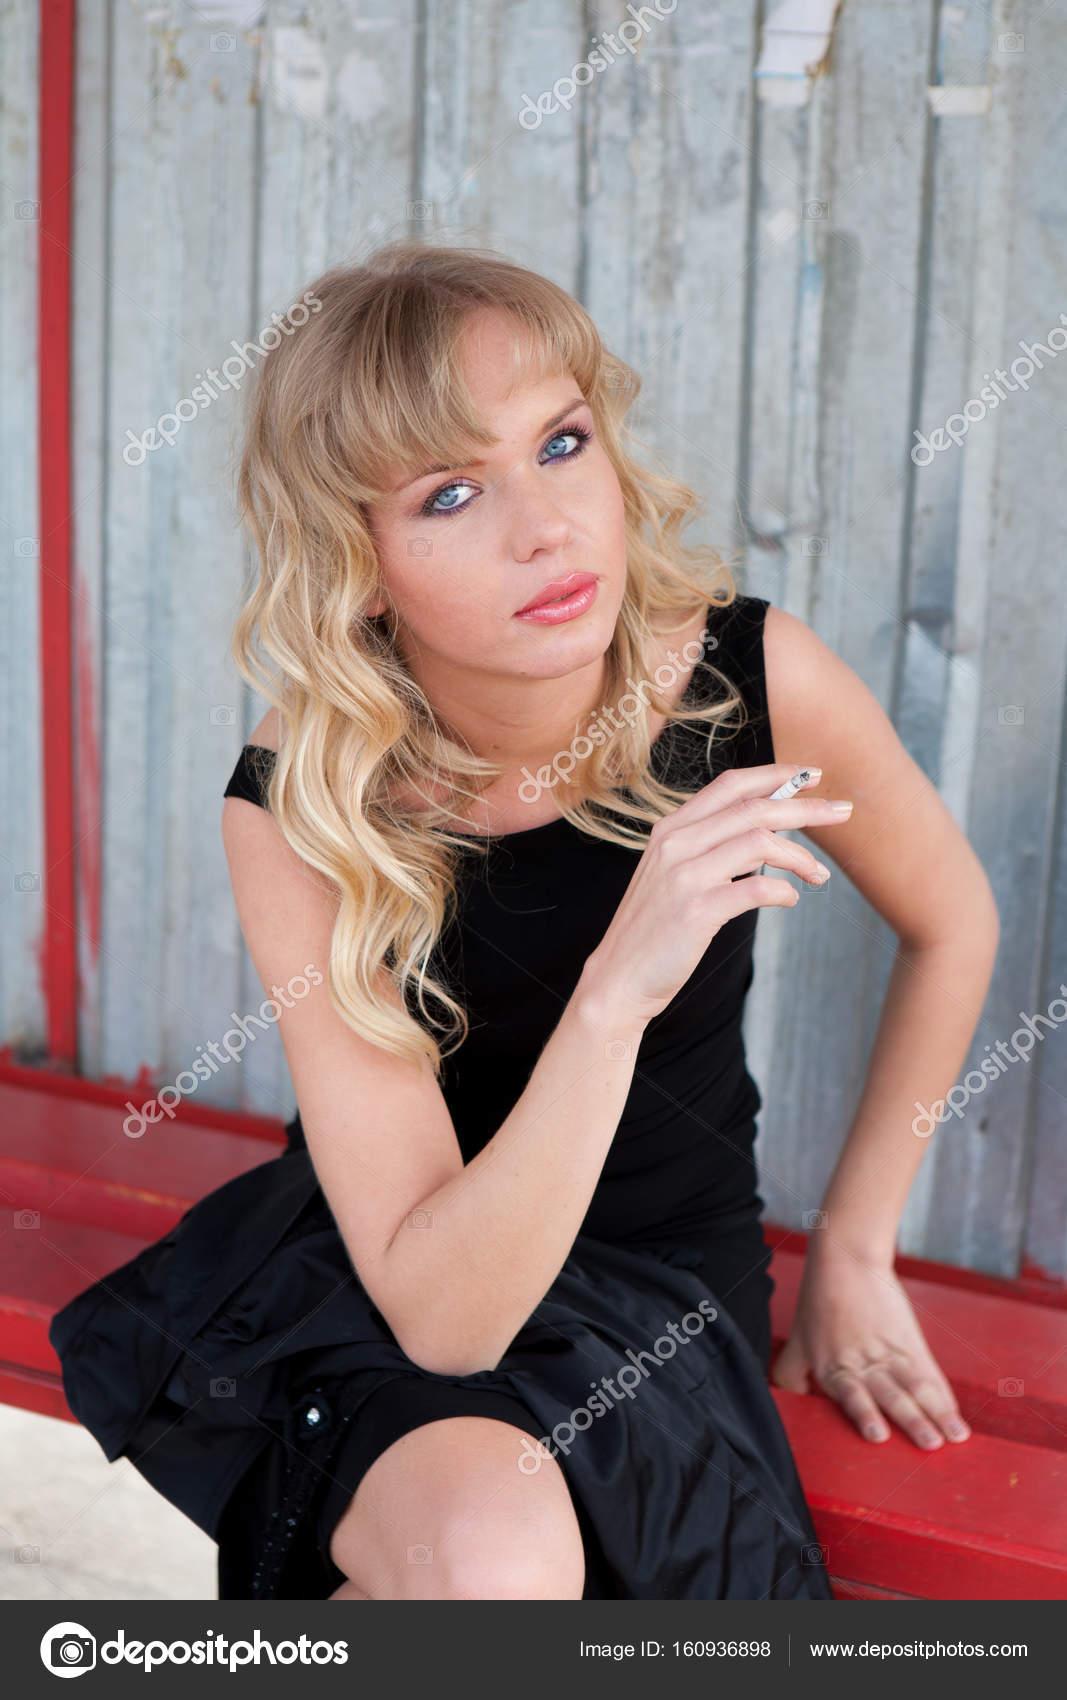 Beautiful female model in a gorgeous classic coat and pretty